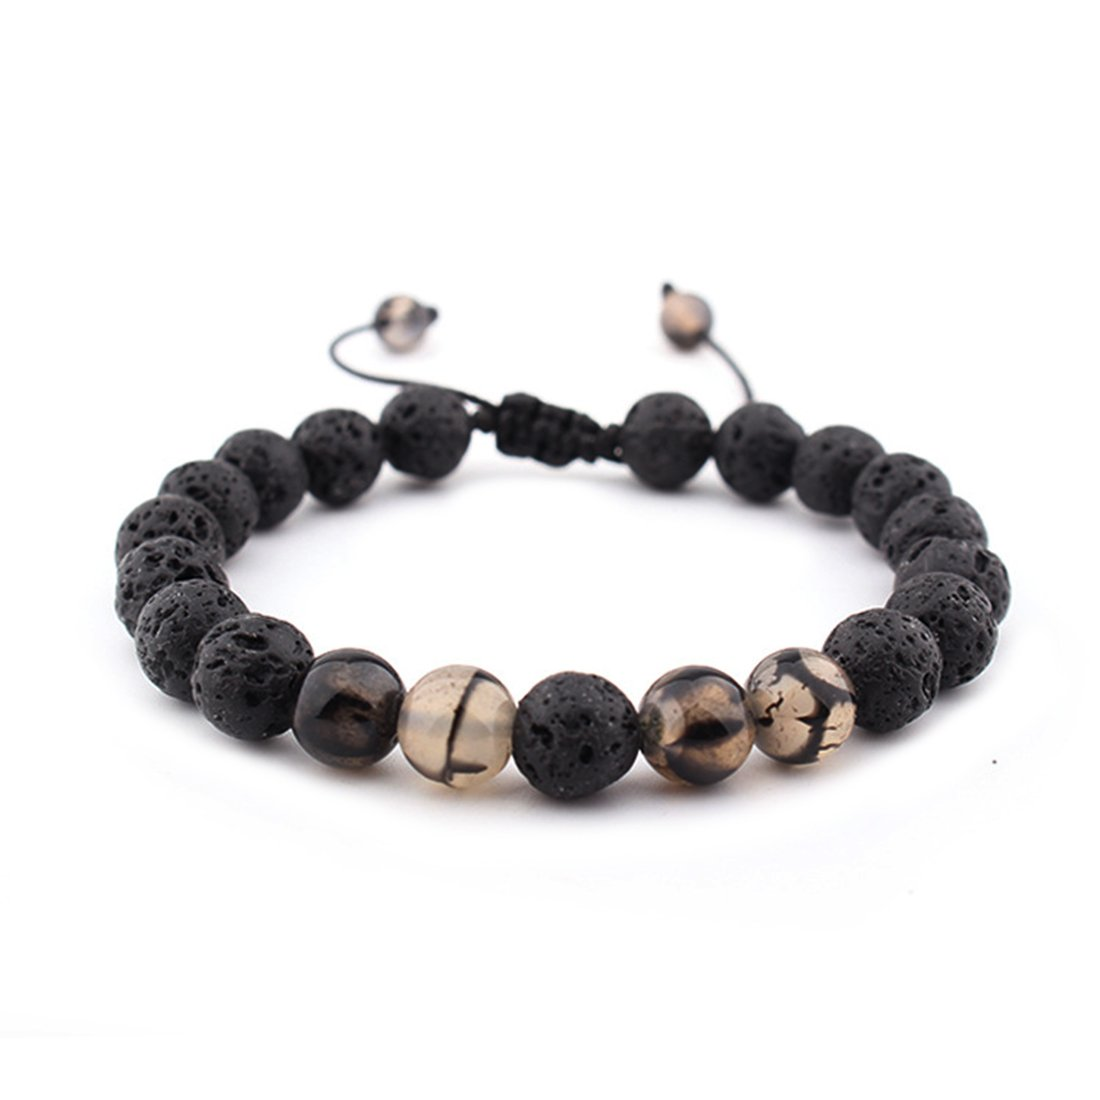 Unisex Adjustable Lava Stone Diffuser Bracele meditation healing natural Volcano stones Bracelets XIAFEN XFSZCANA129-CP